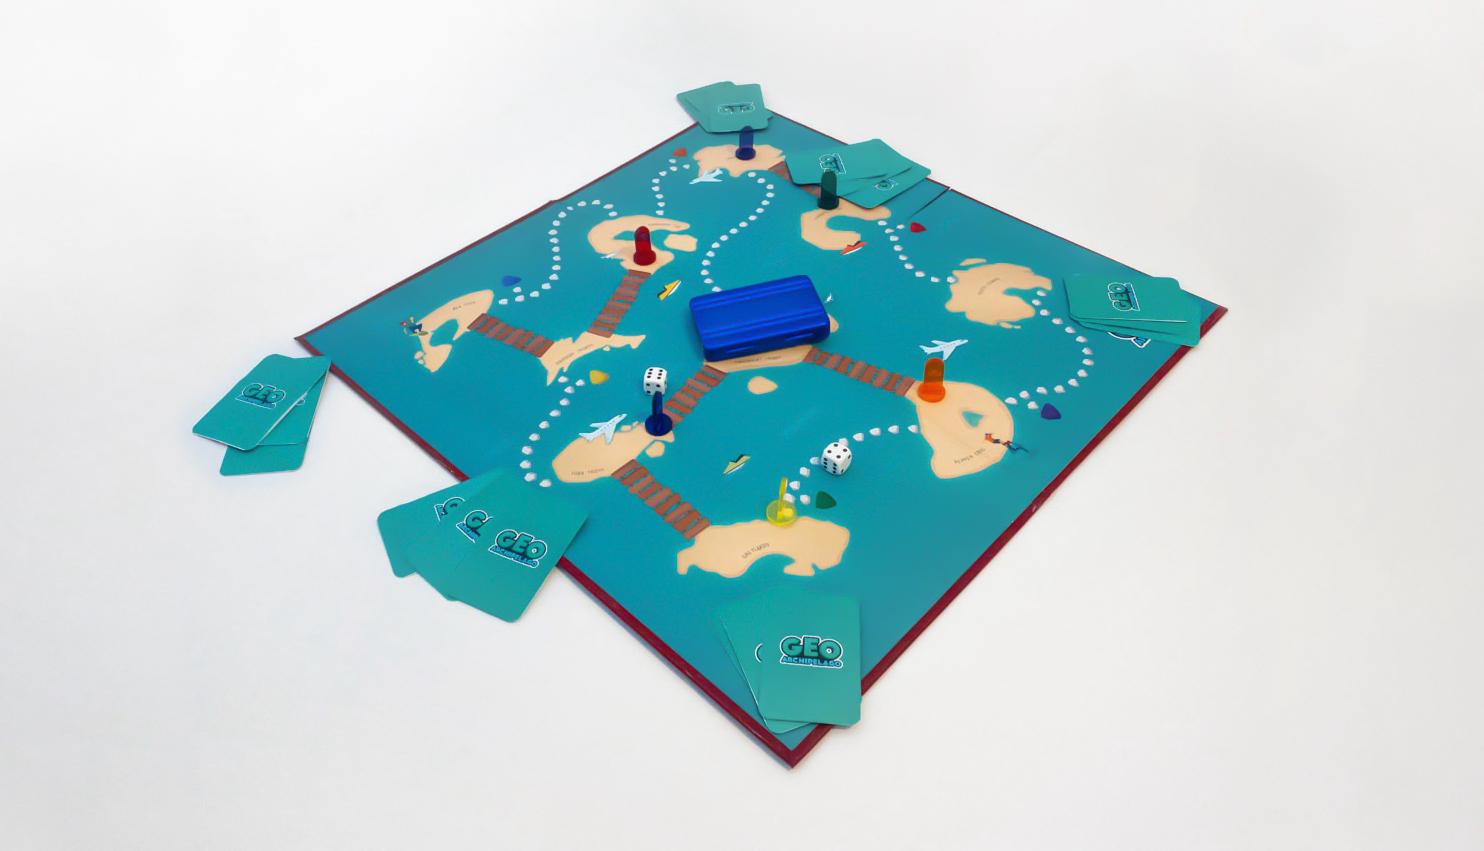 full board game photo